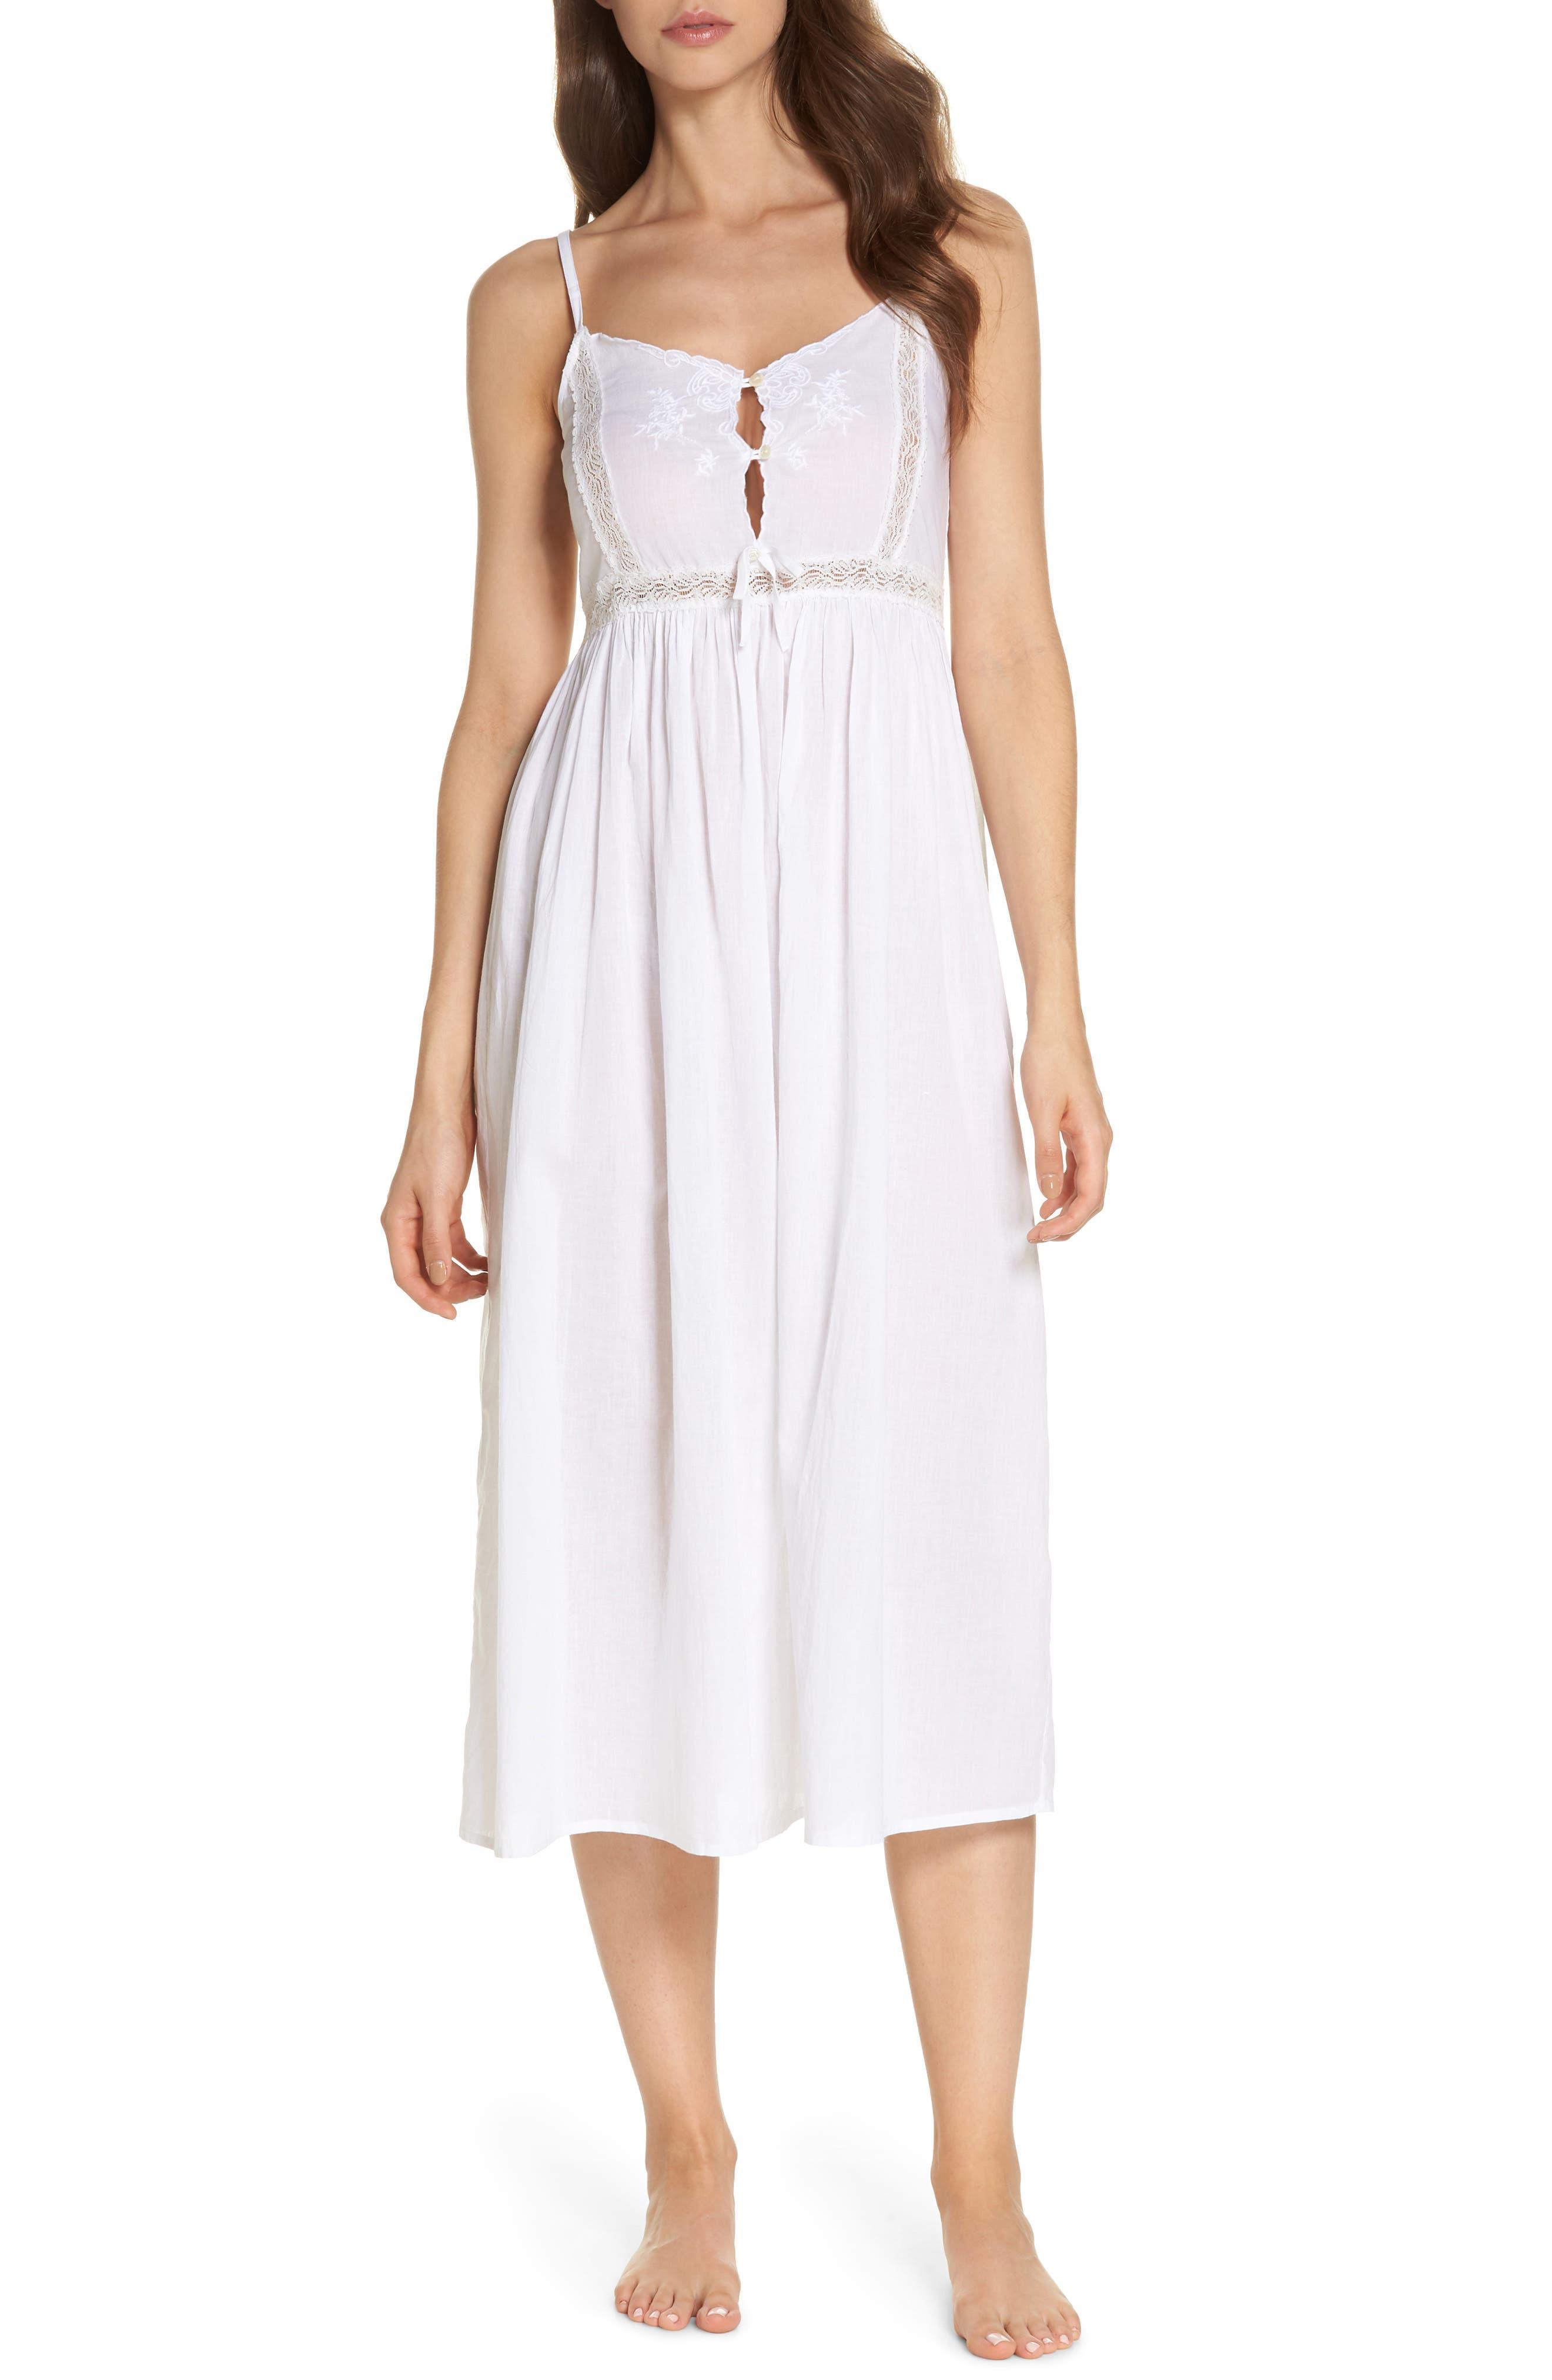 Lace Trim Nightgown,                         Main,                         color, White